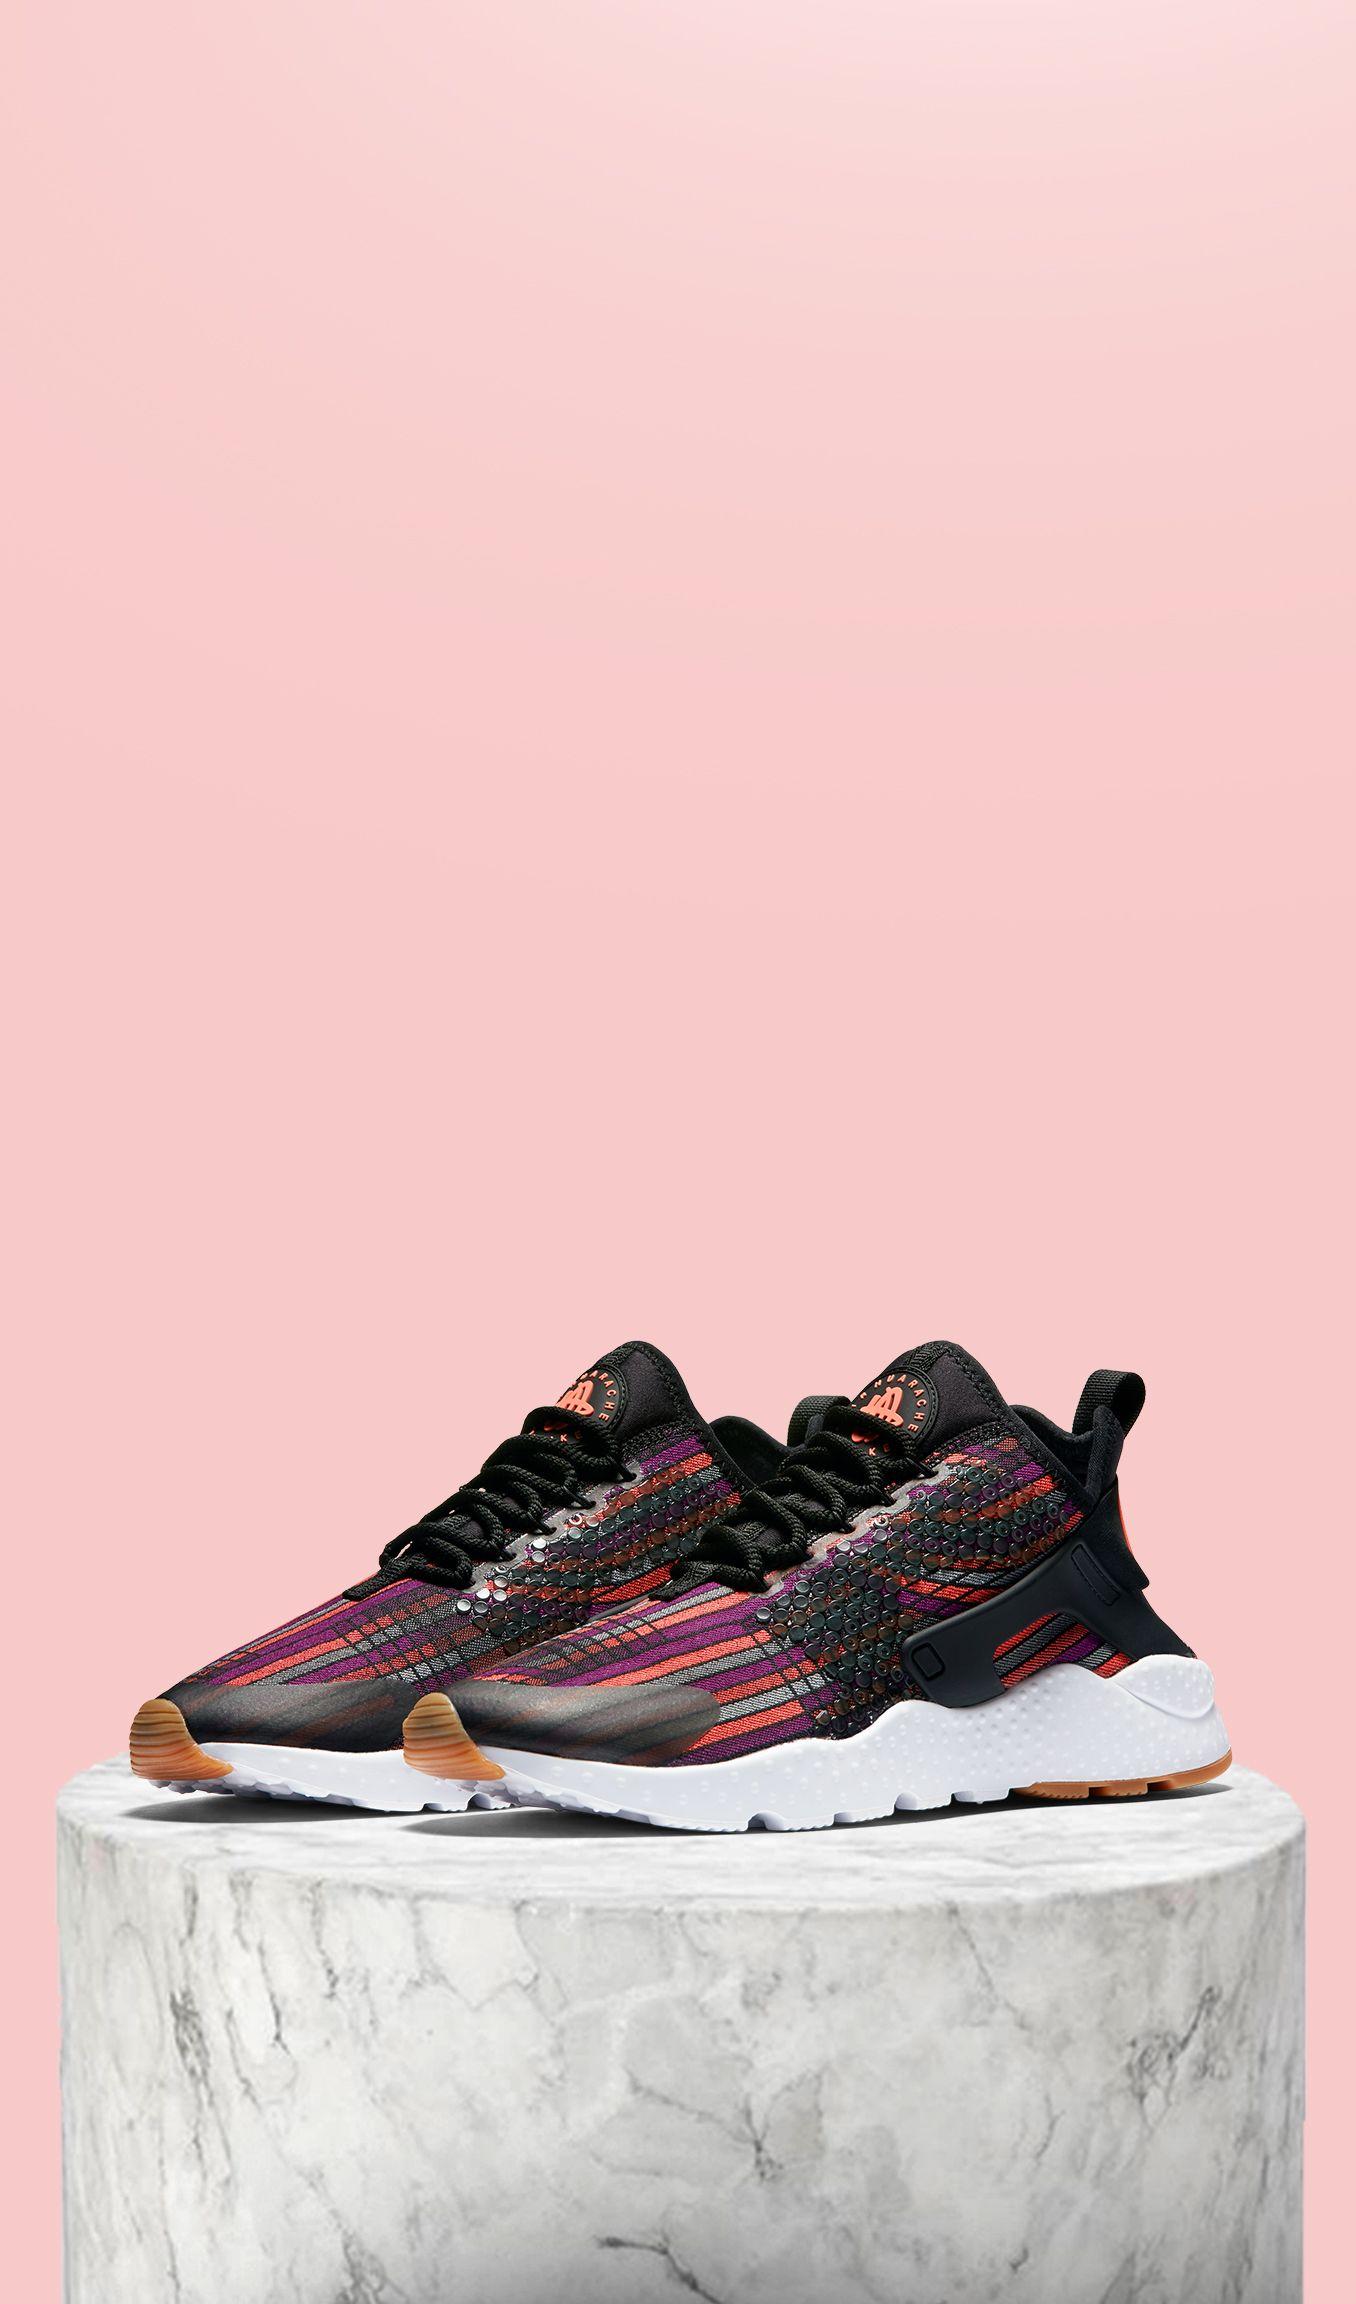 Nike Beautiful x Air Huarache Ultra Jacquard Premium